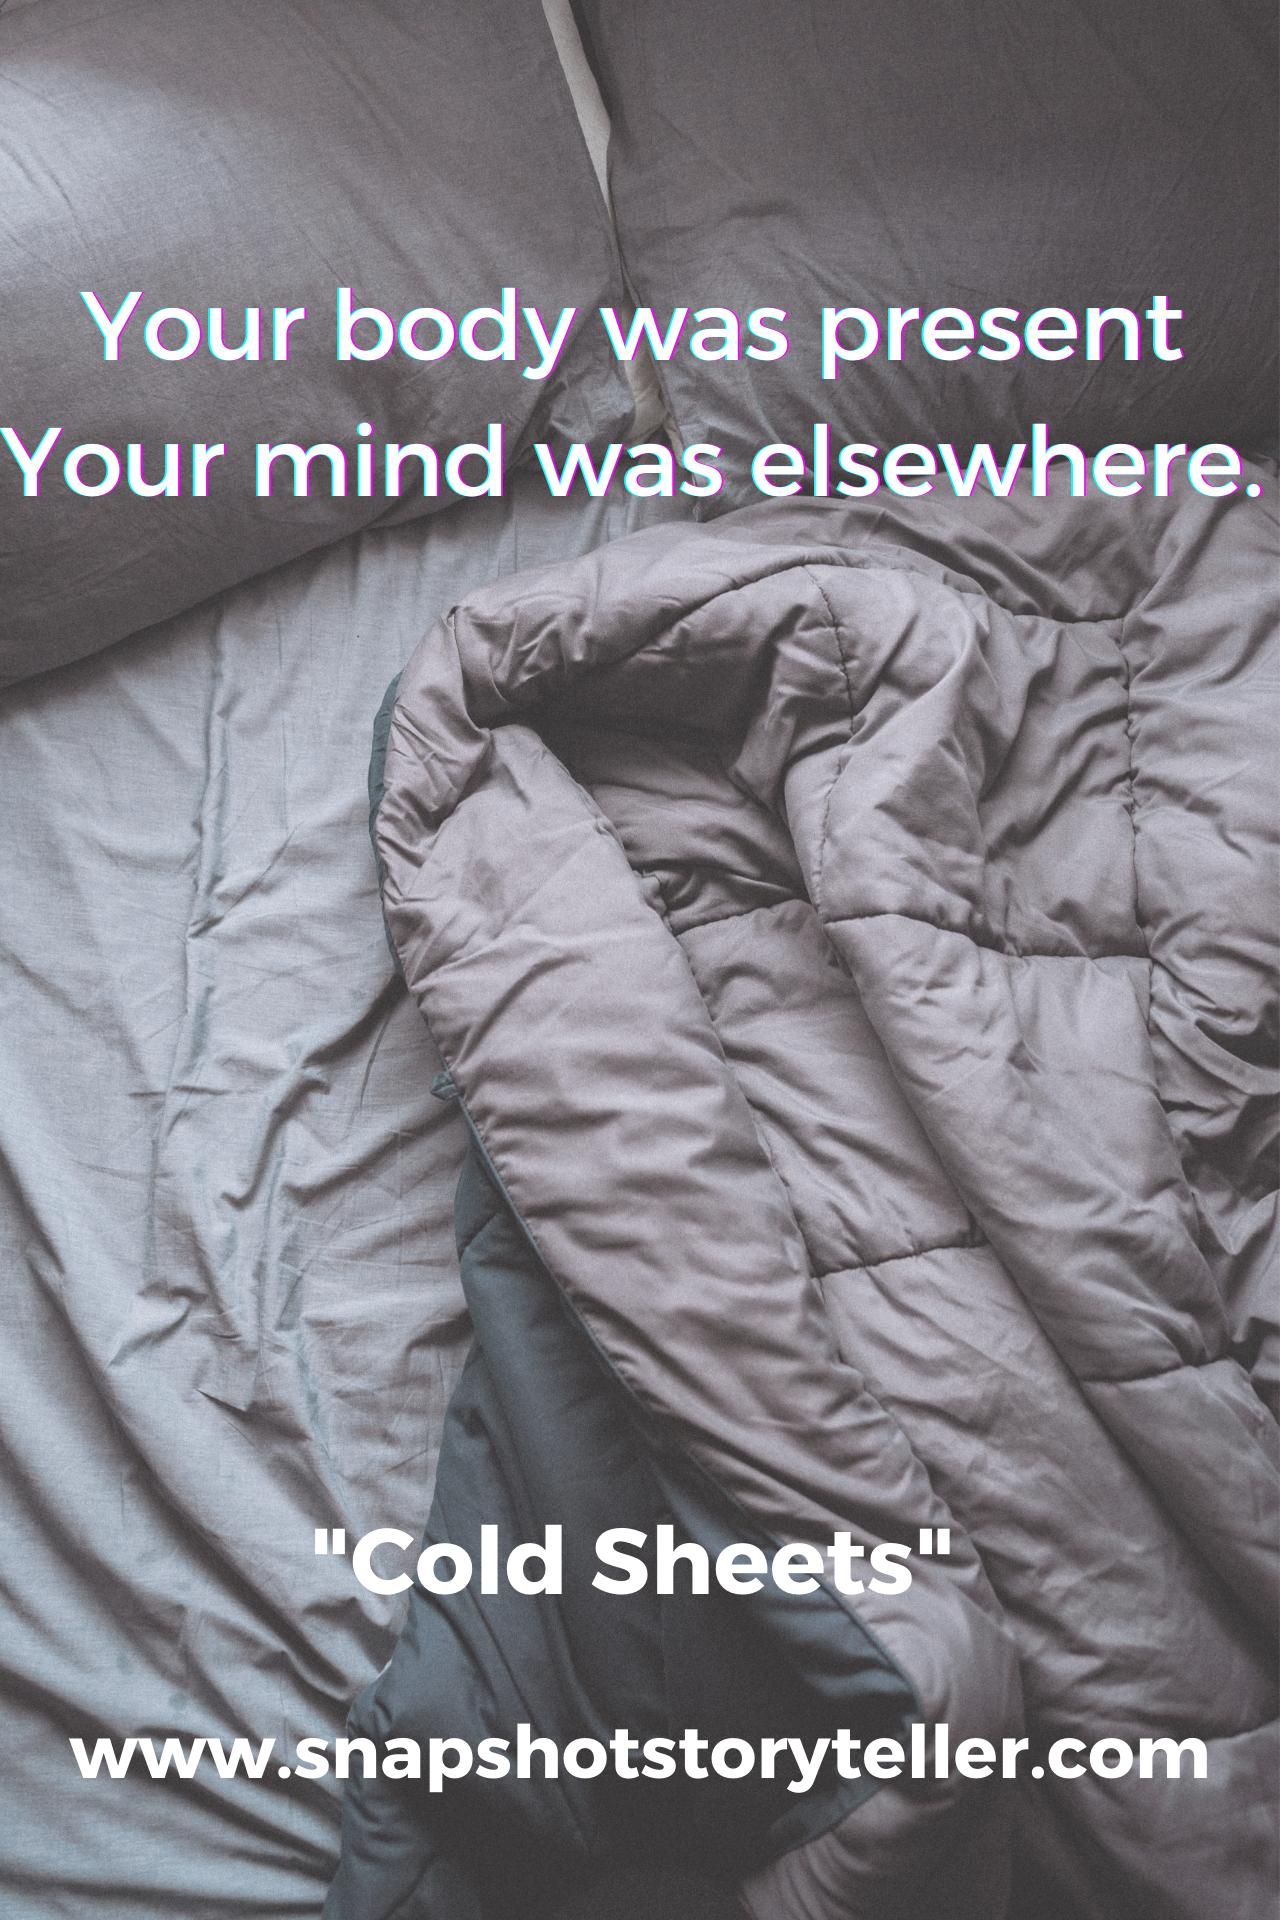 Snapshot Storyteller | Cold Sheets | www.snapshotstoryteller.com | #amwriting #SnapshotStoryteller #creativestoryteller #creative #storyteller #creativewriter #IWrite #WriteOn #writersofinstagram